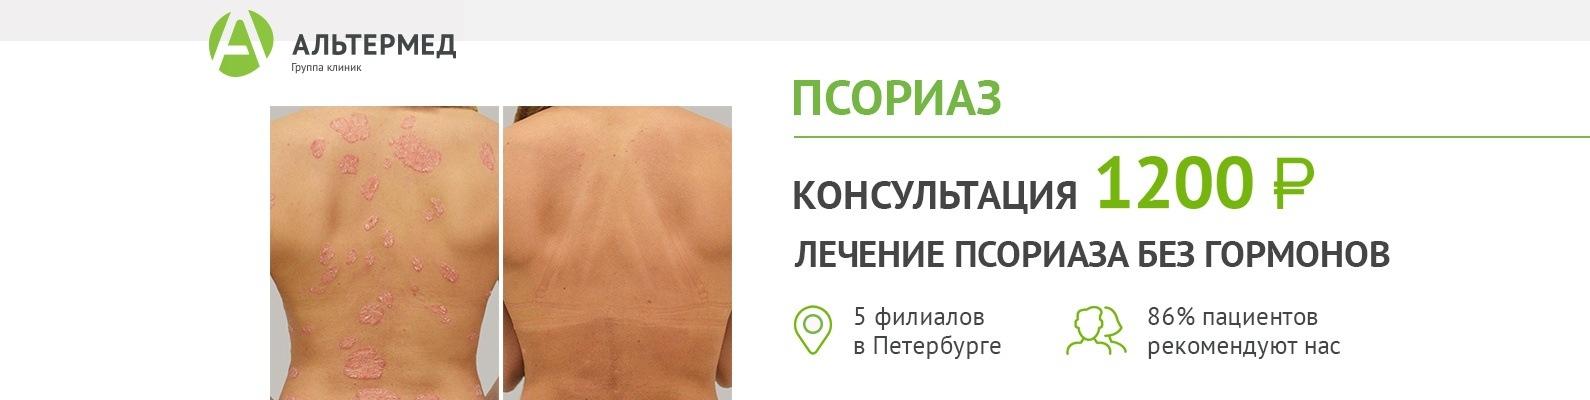 Кеналог 40 Псориаз